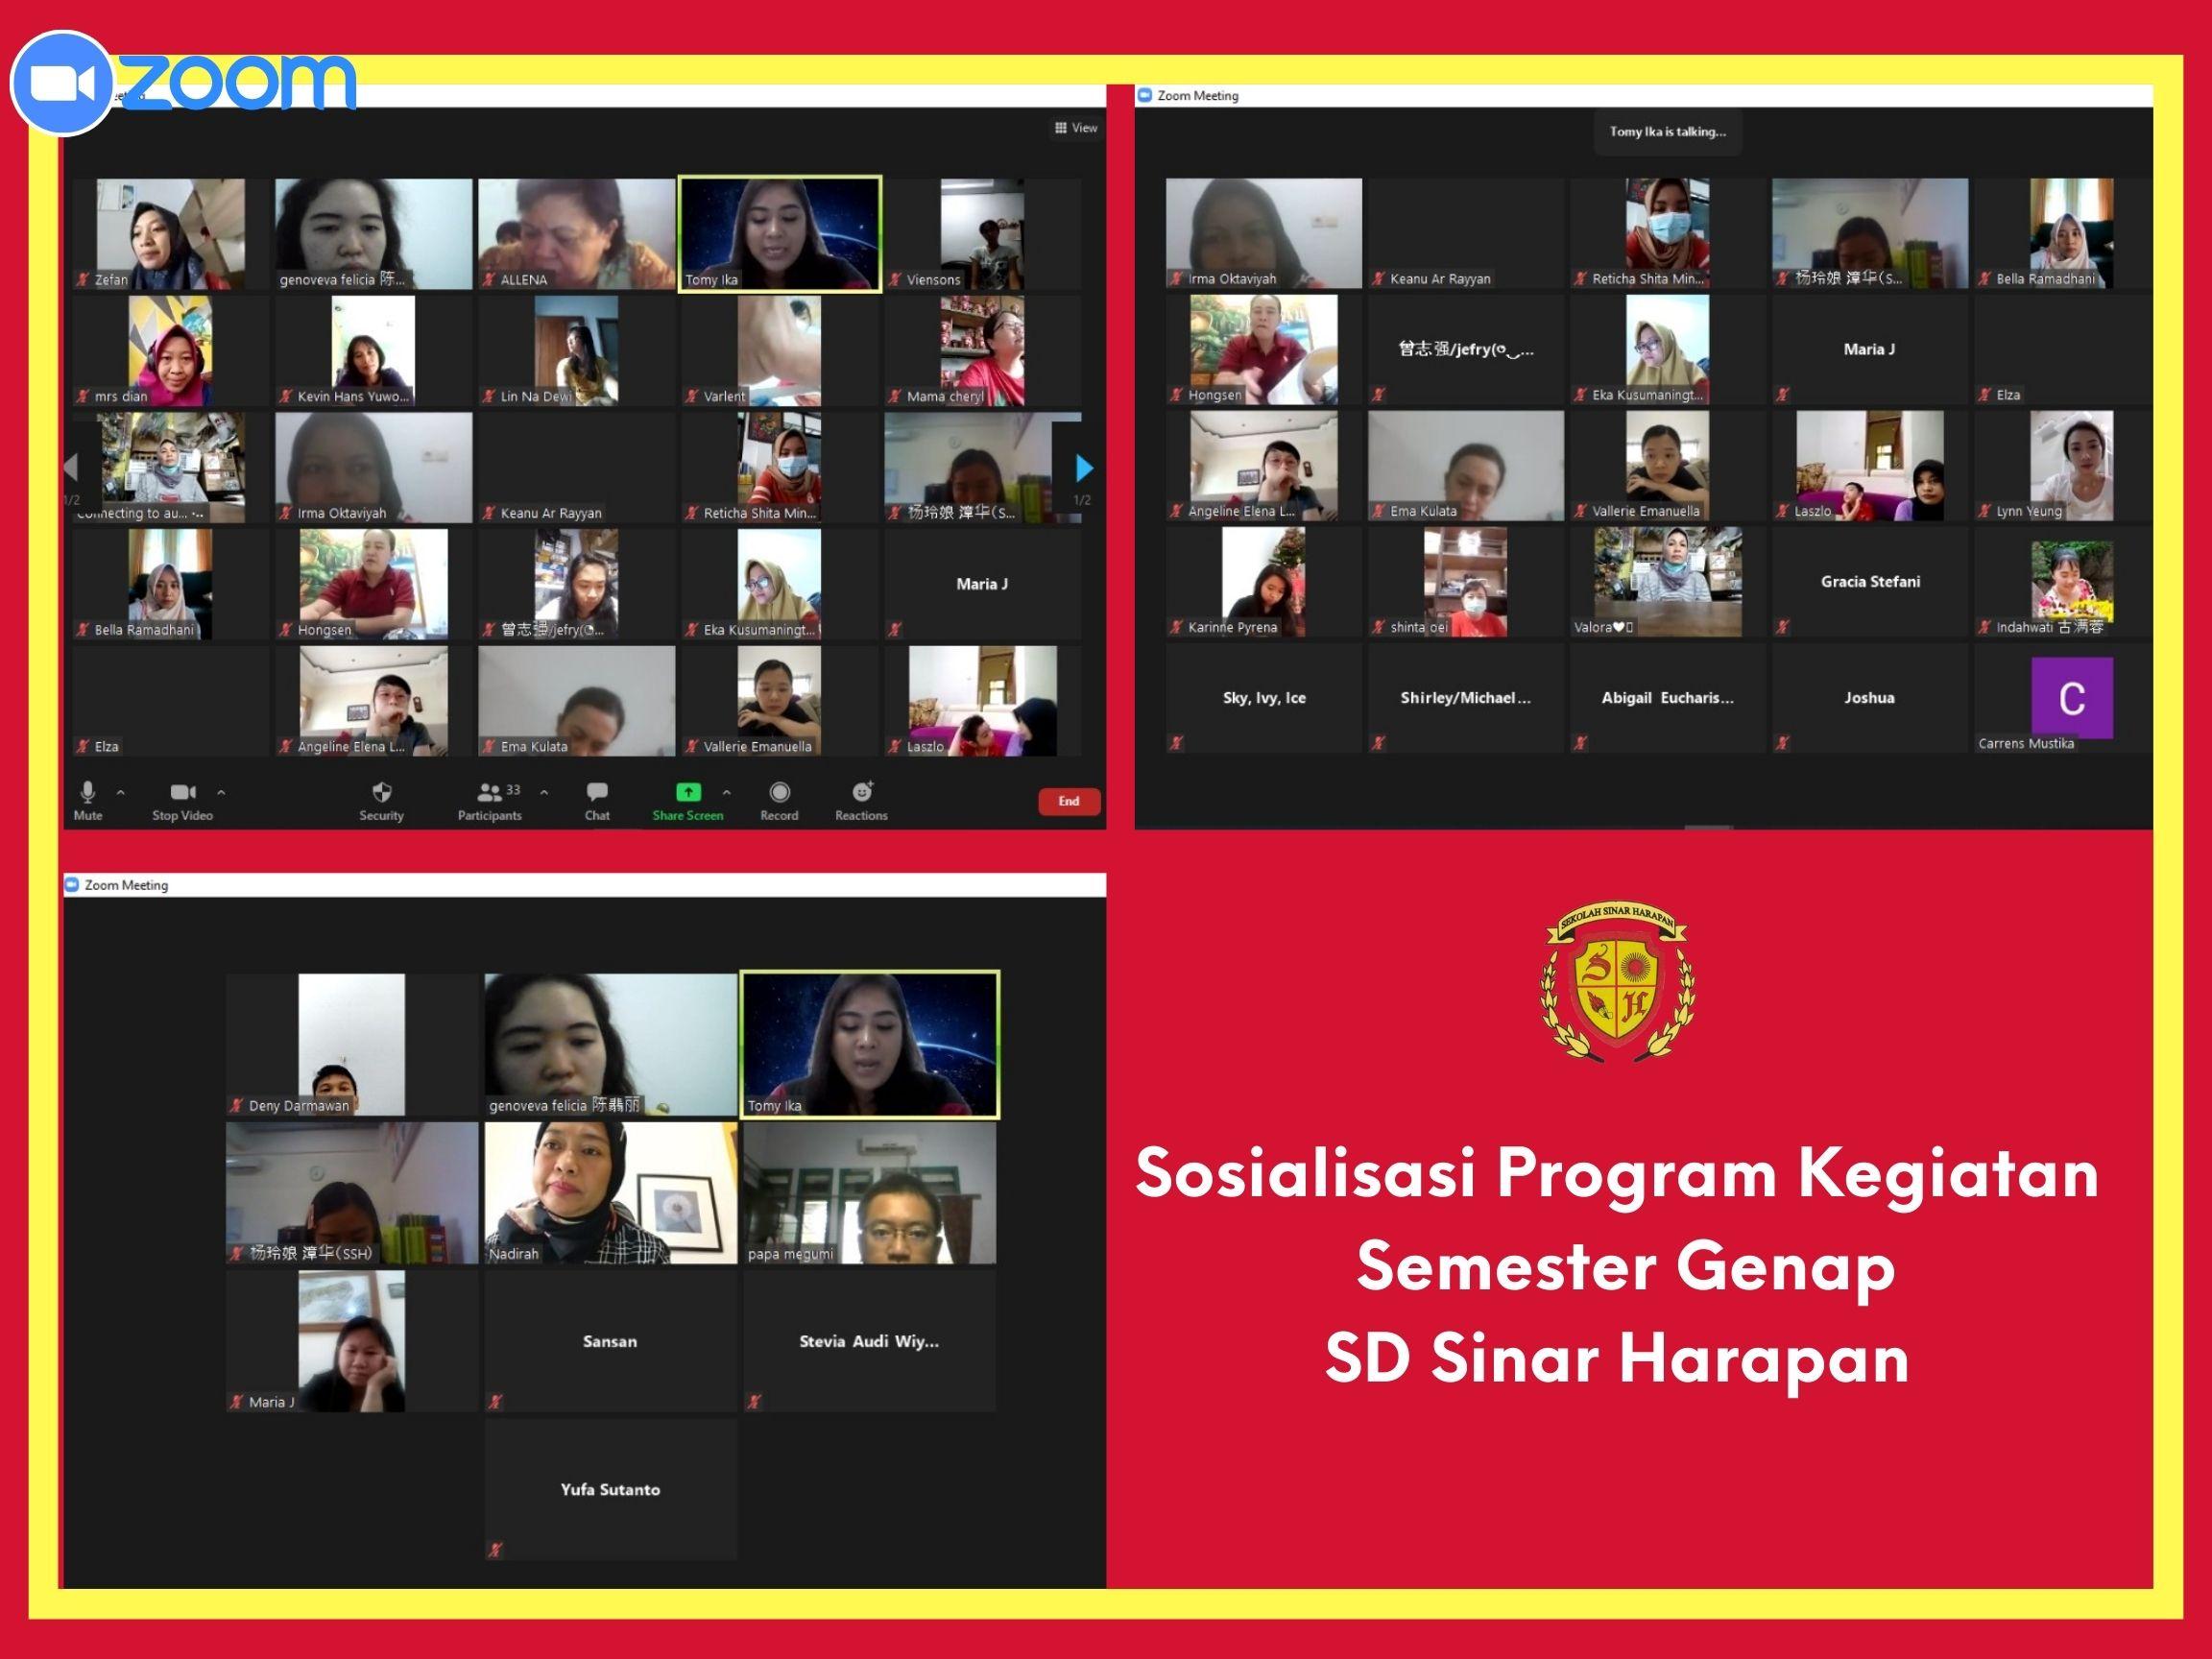 Sosialisasi Program Kegiatan Semester Genap oleh SD Sinar Harapan